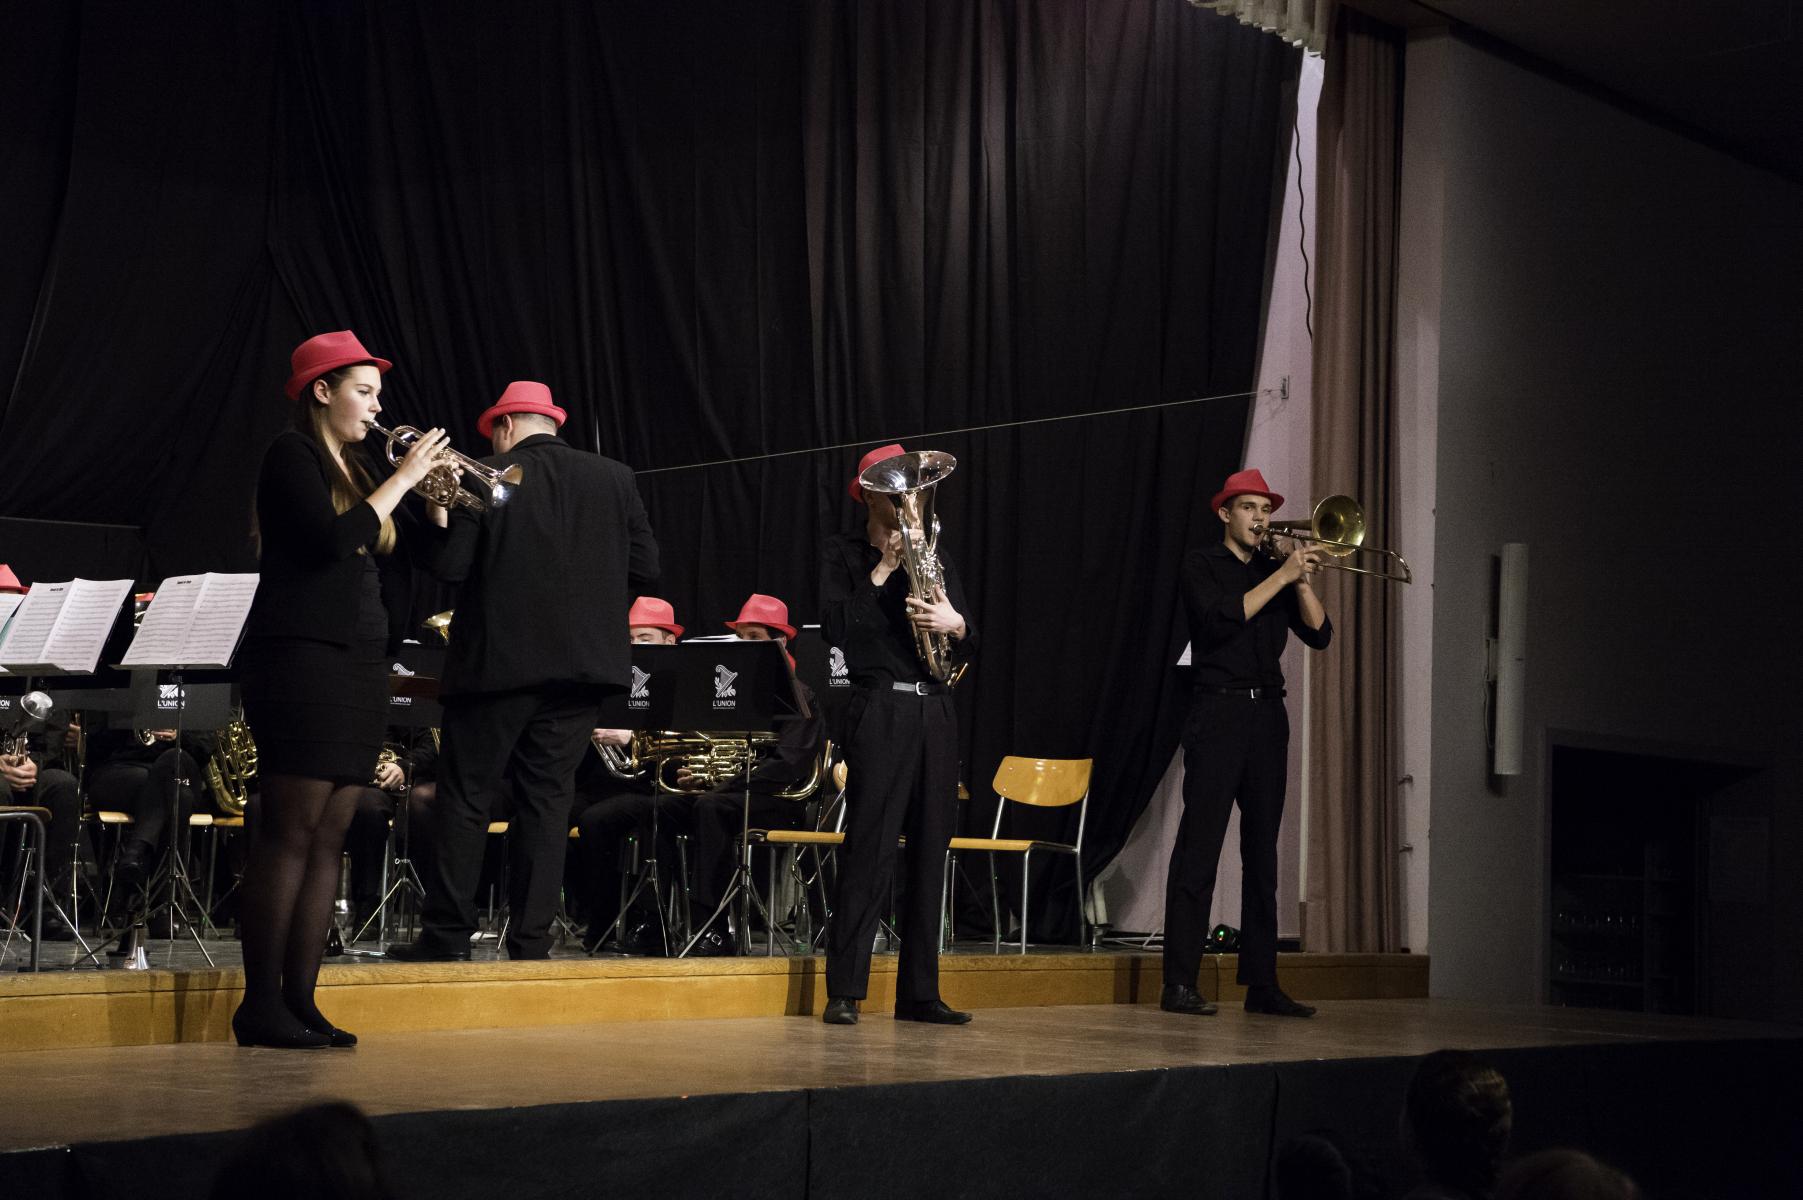 170211_concert_annuel17-065